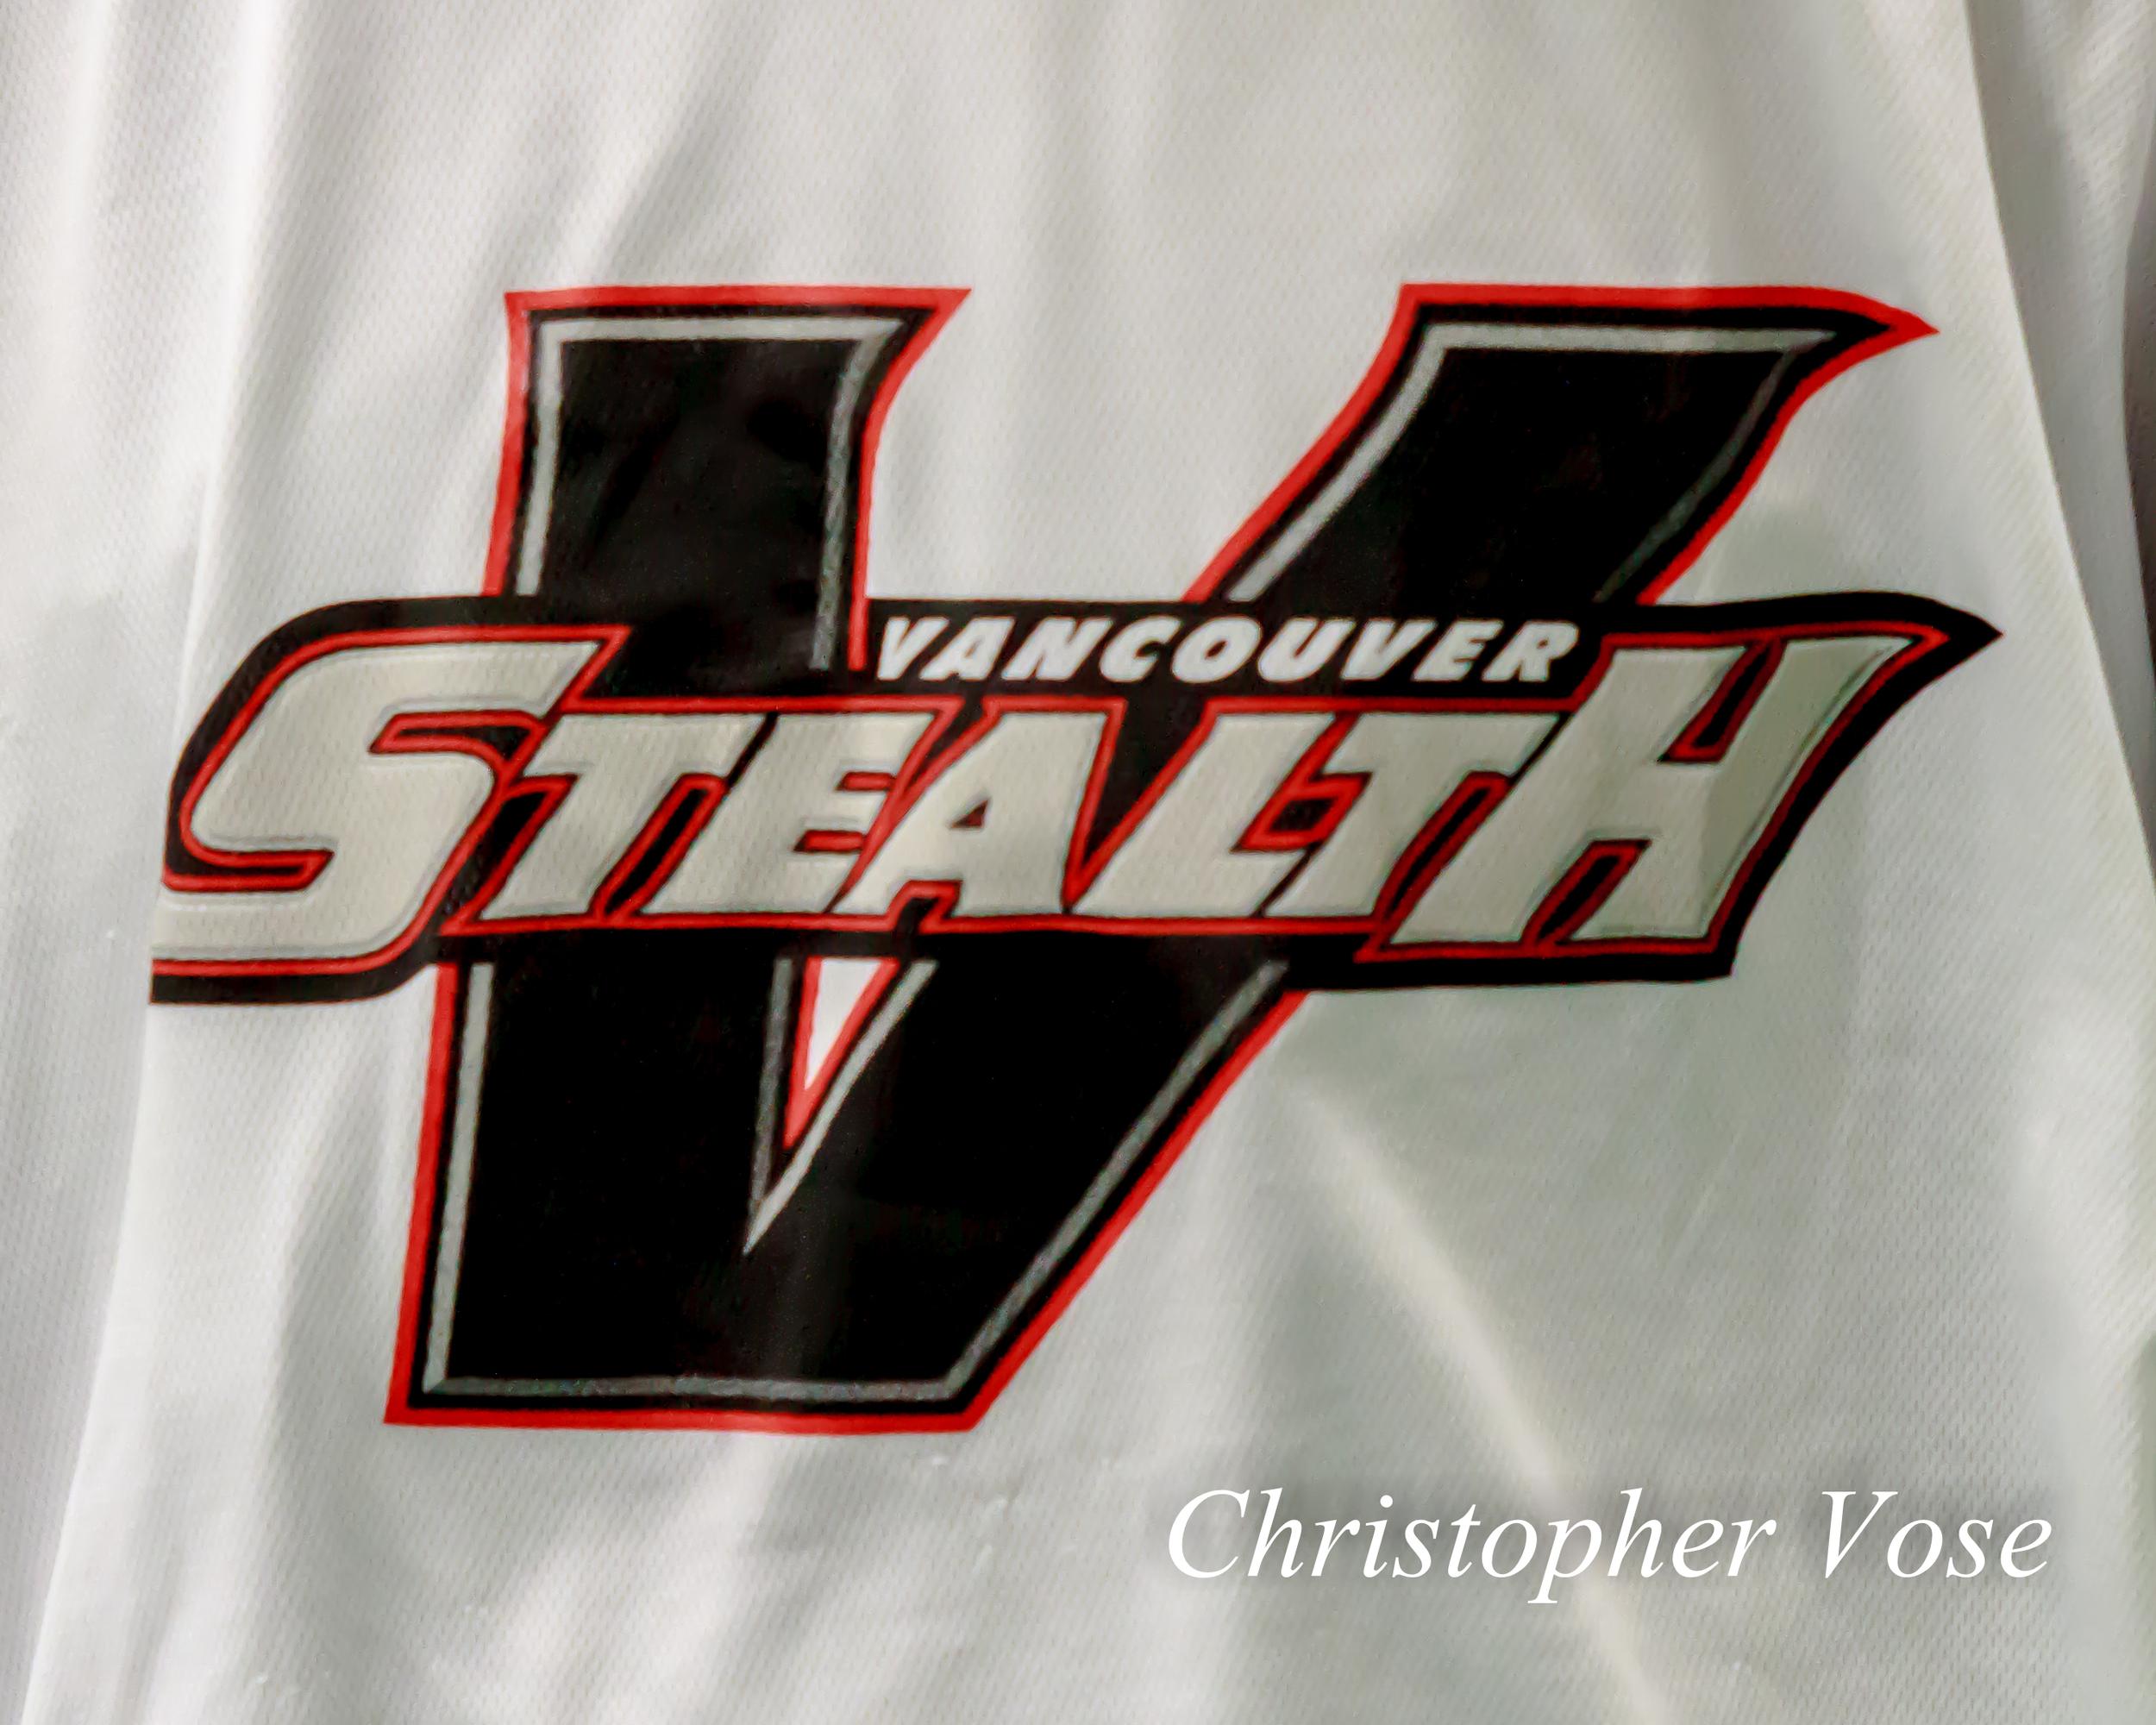 2013-12-22 Vancouver Stealth Crest.jpg